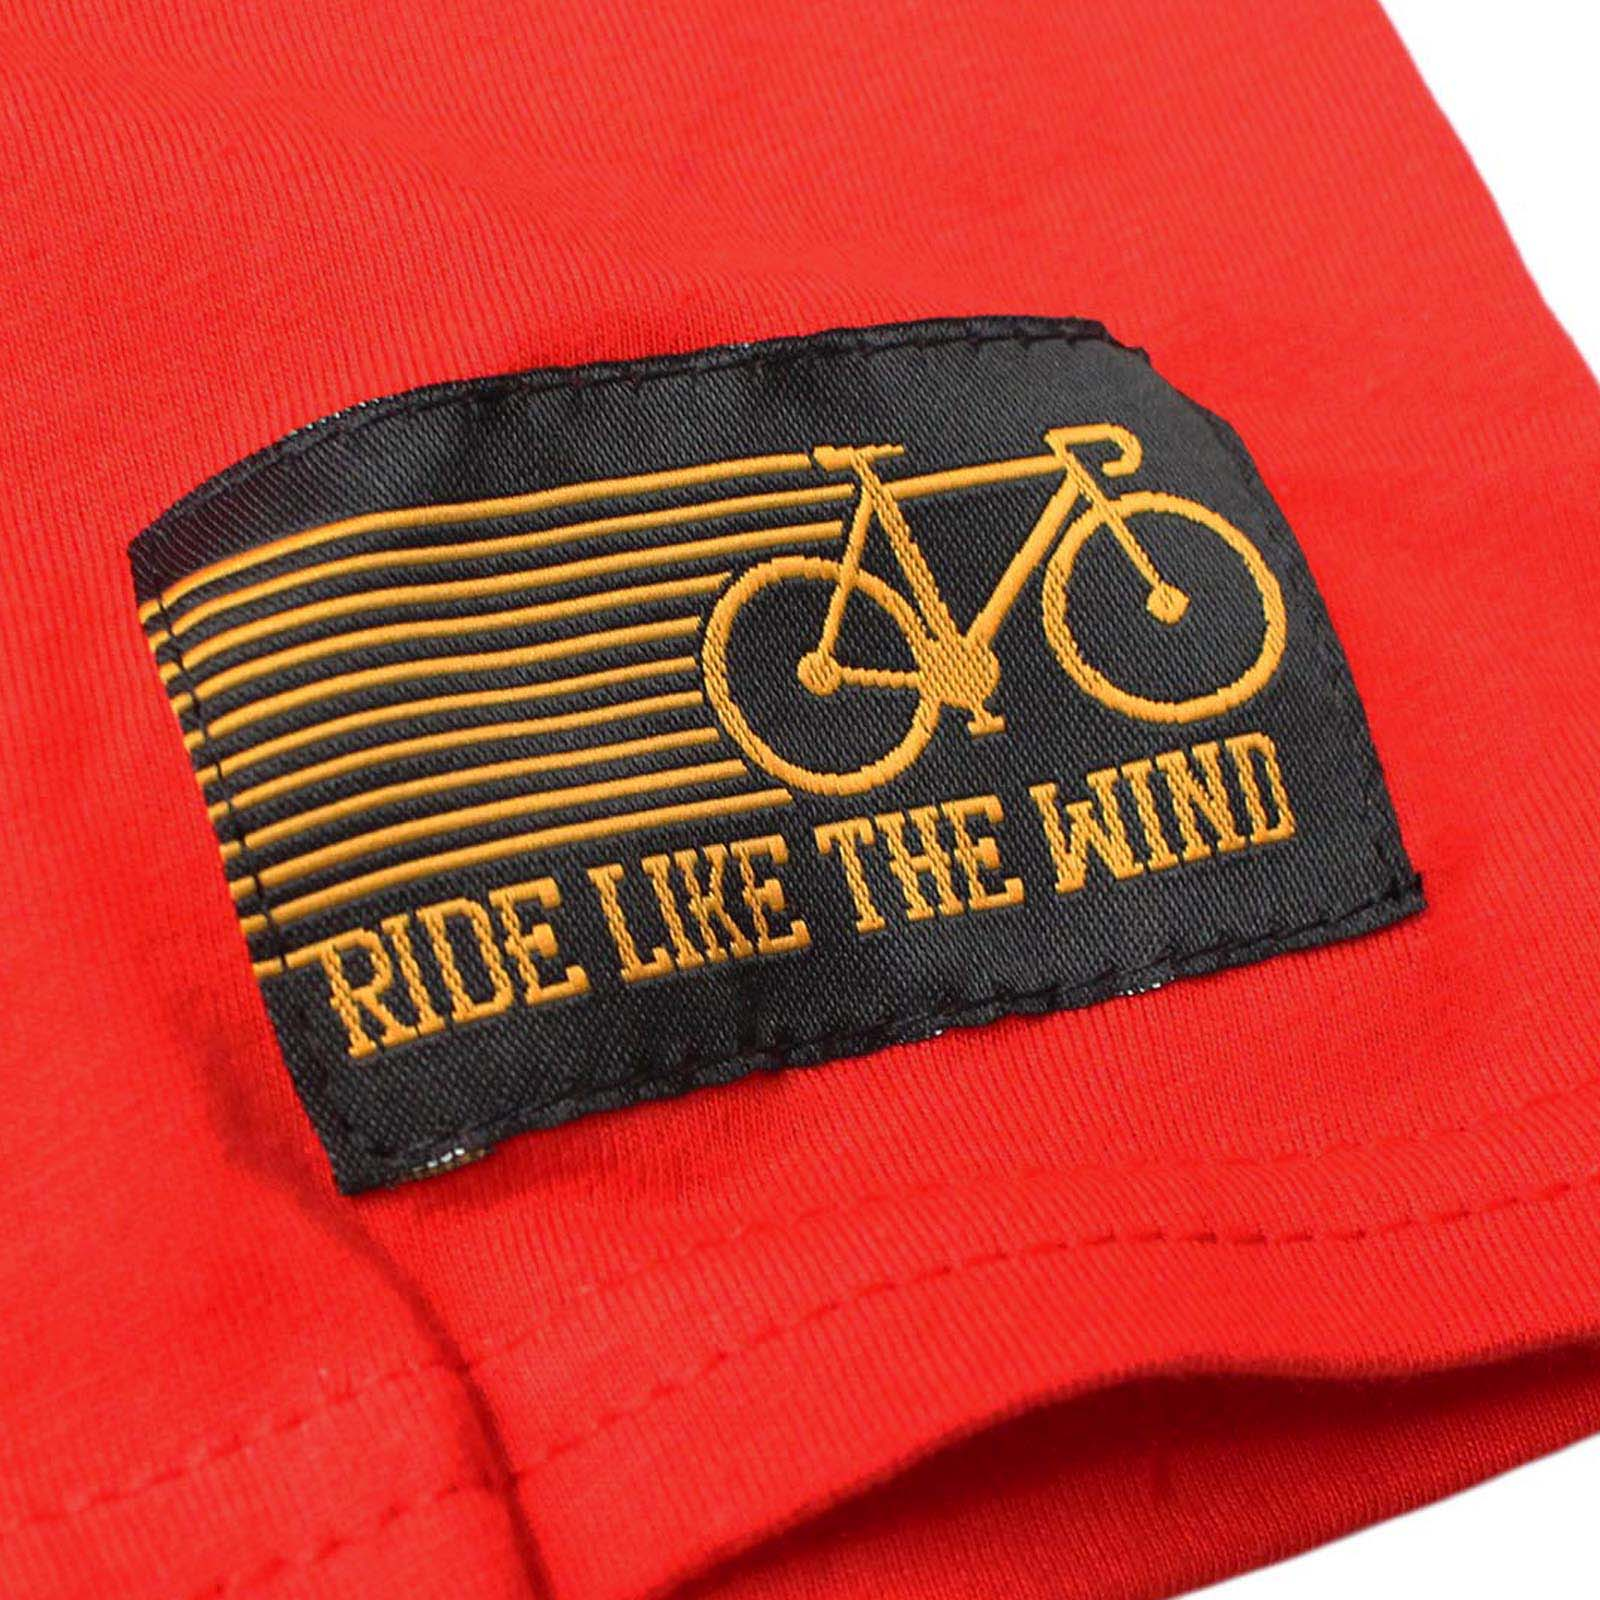 Cycling-T-Shirt-Funny-Novelty-Mens-tee-TShirt-Bike-Part-Words thumbnail 28